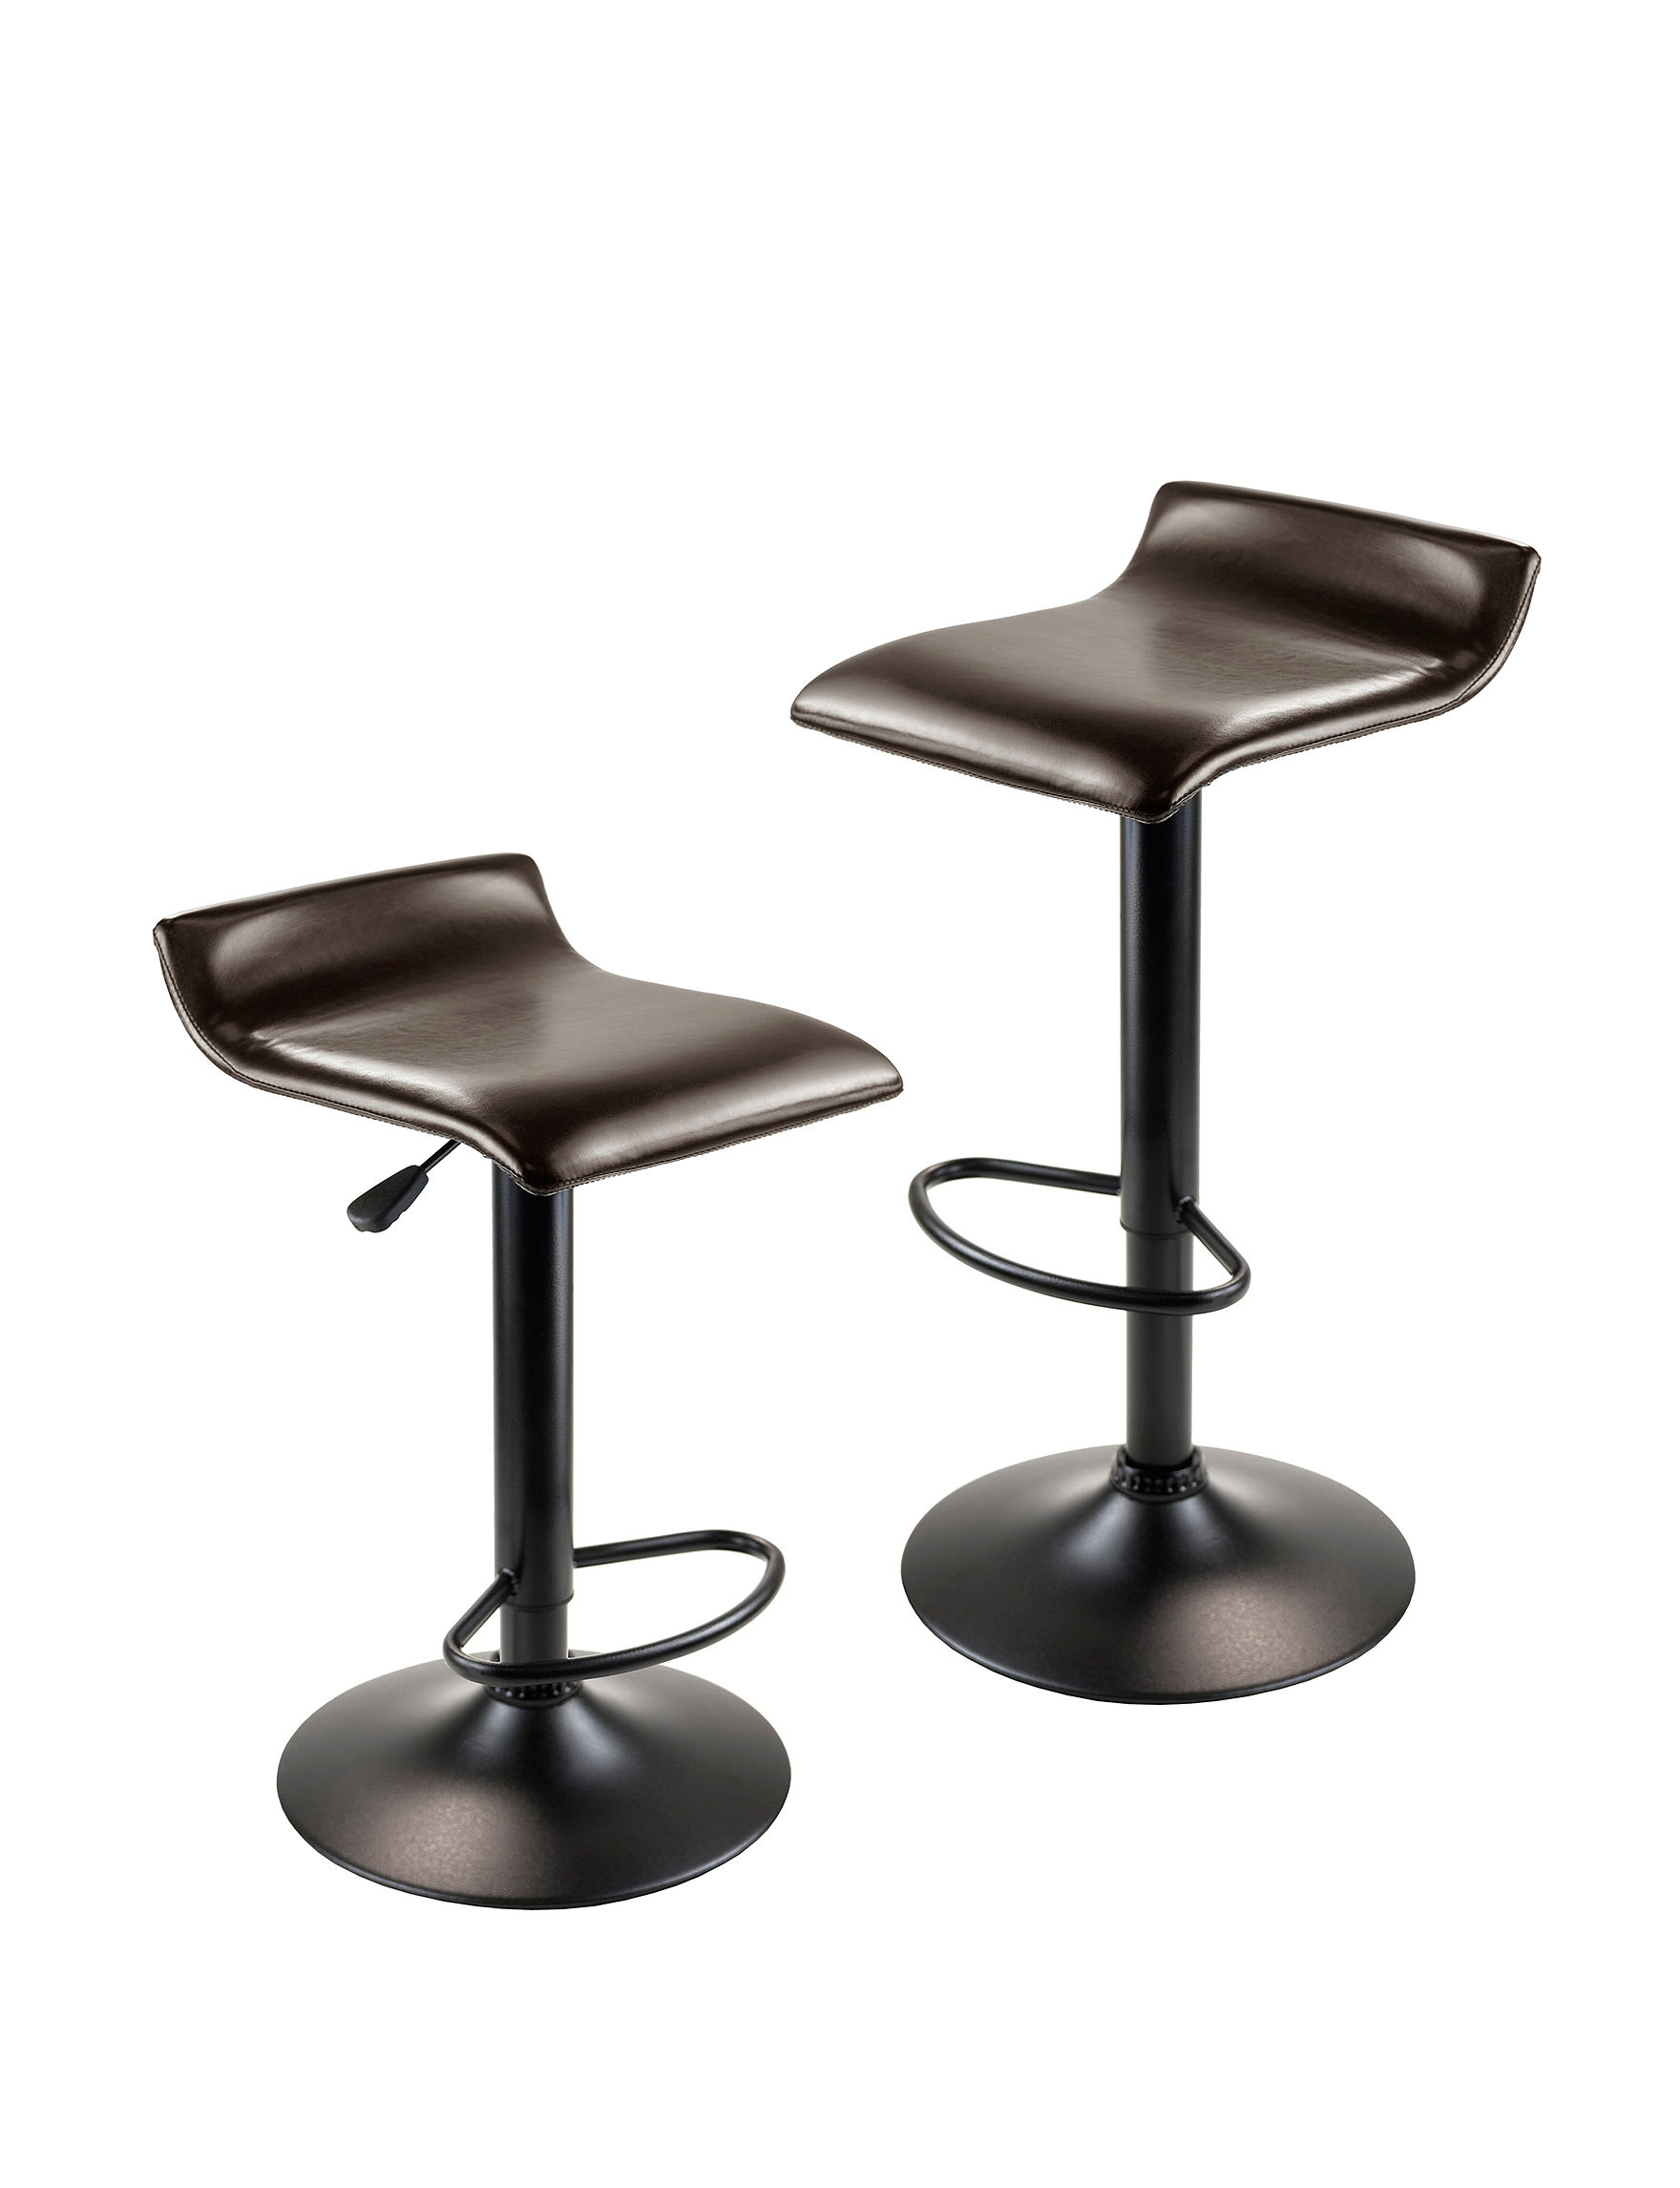 Winsome Espresso Bar & Kitchen Stools Kitchen & Dining Furniture